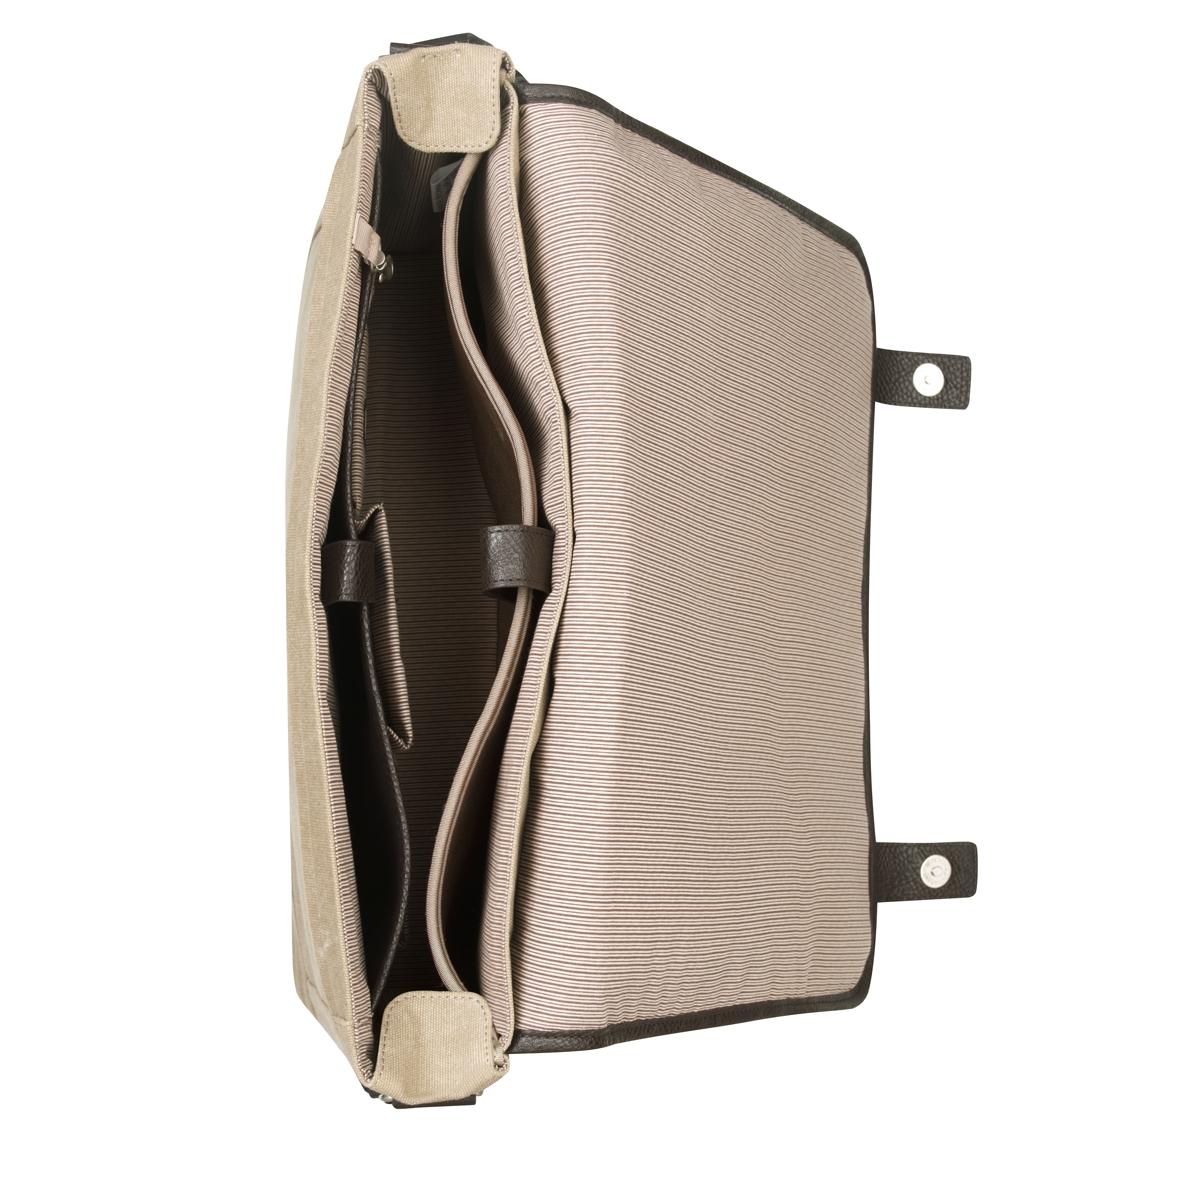 The Fusion Canvas Messenger Bag